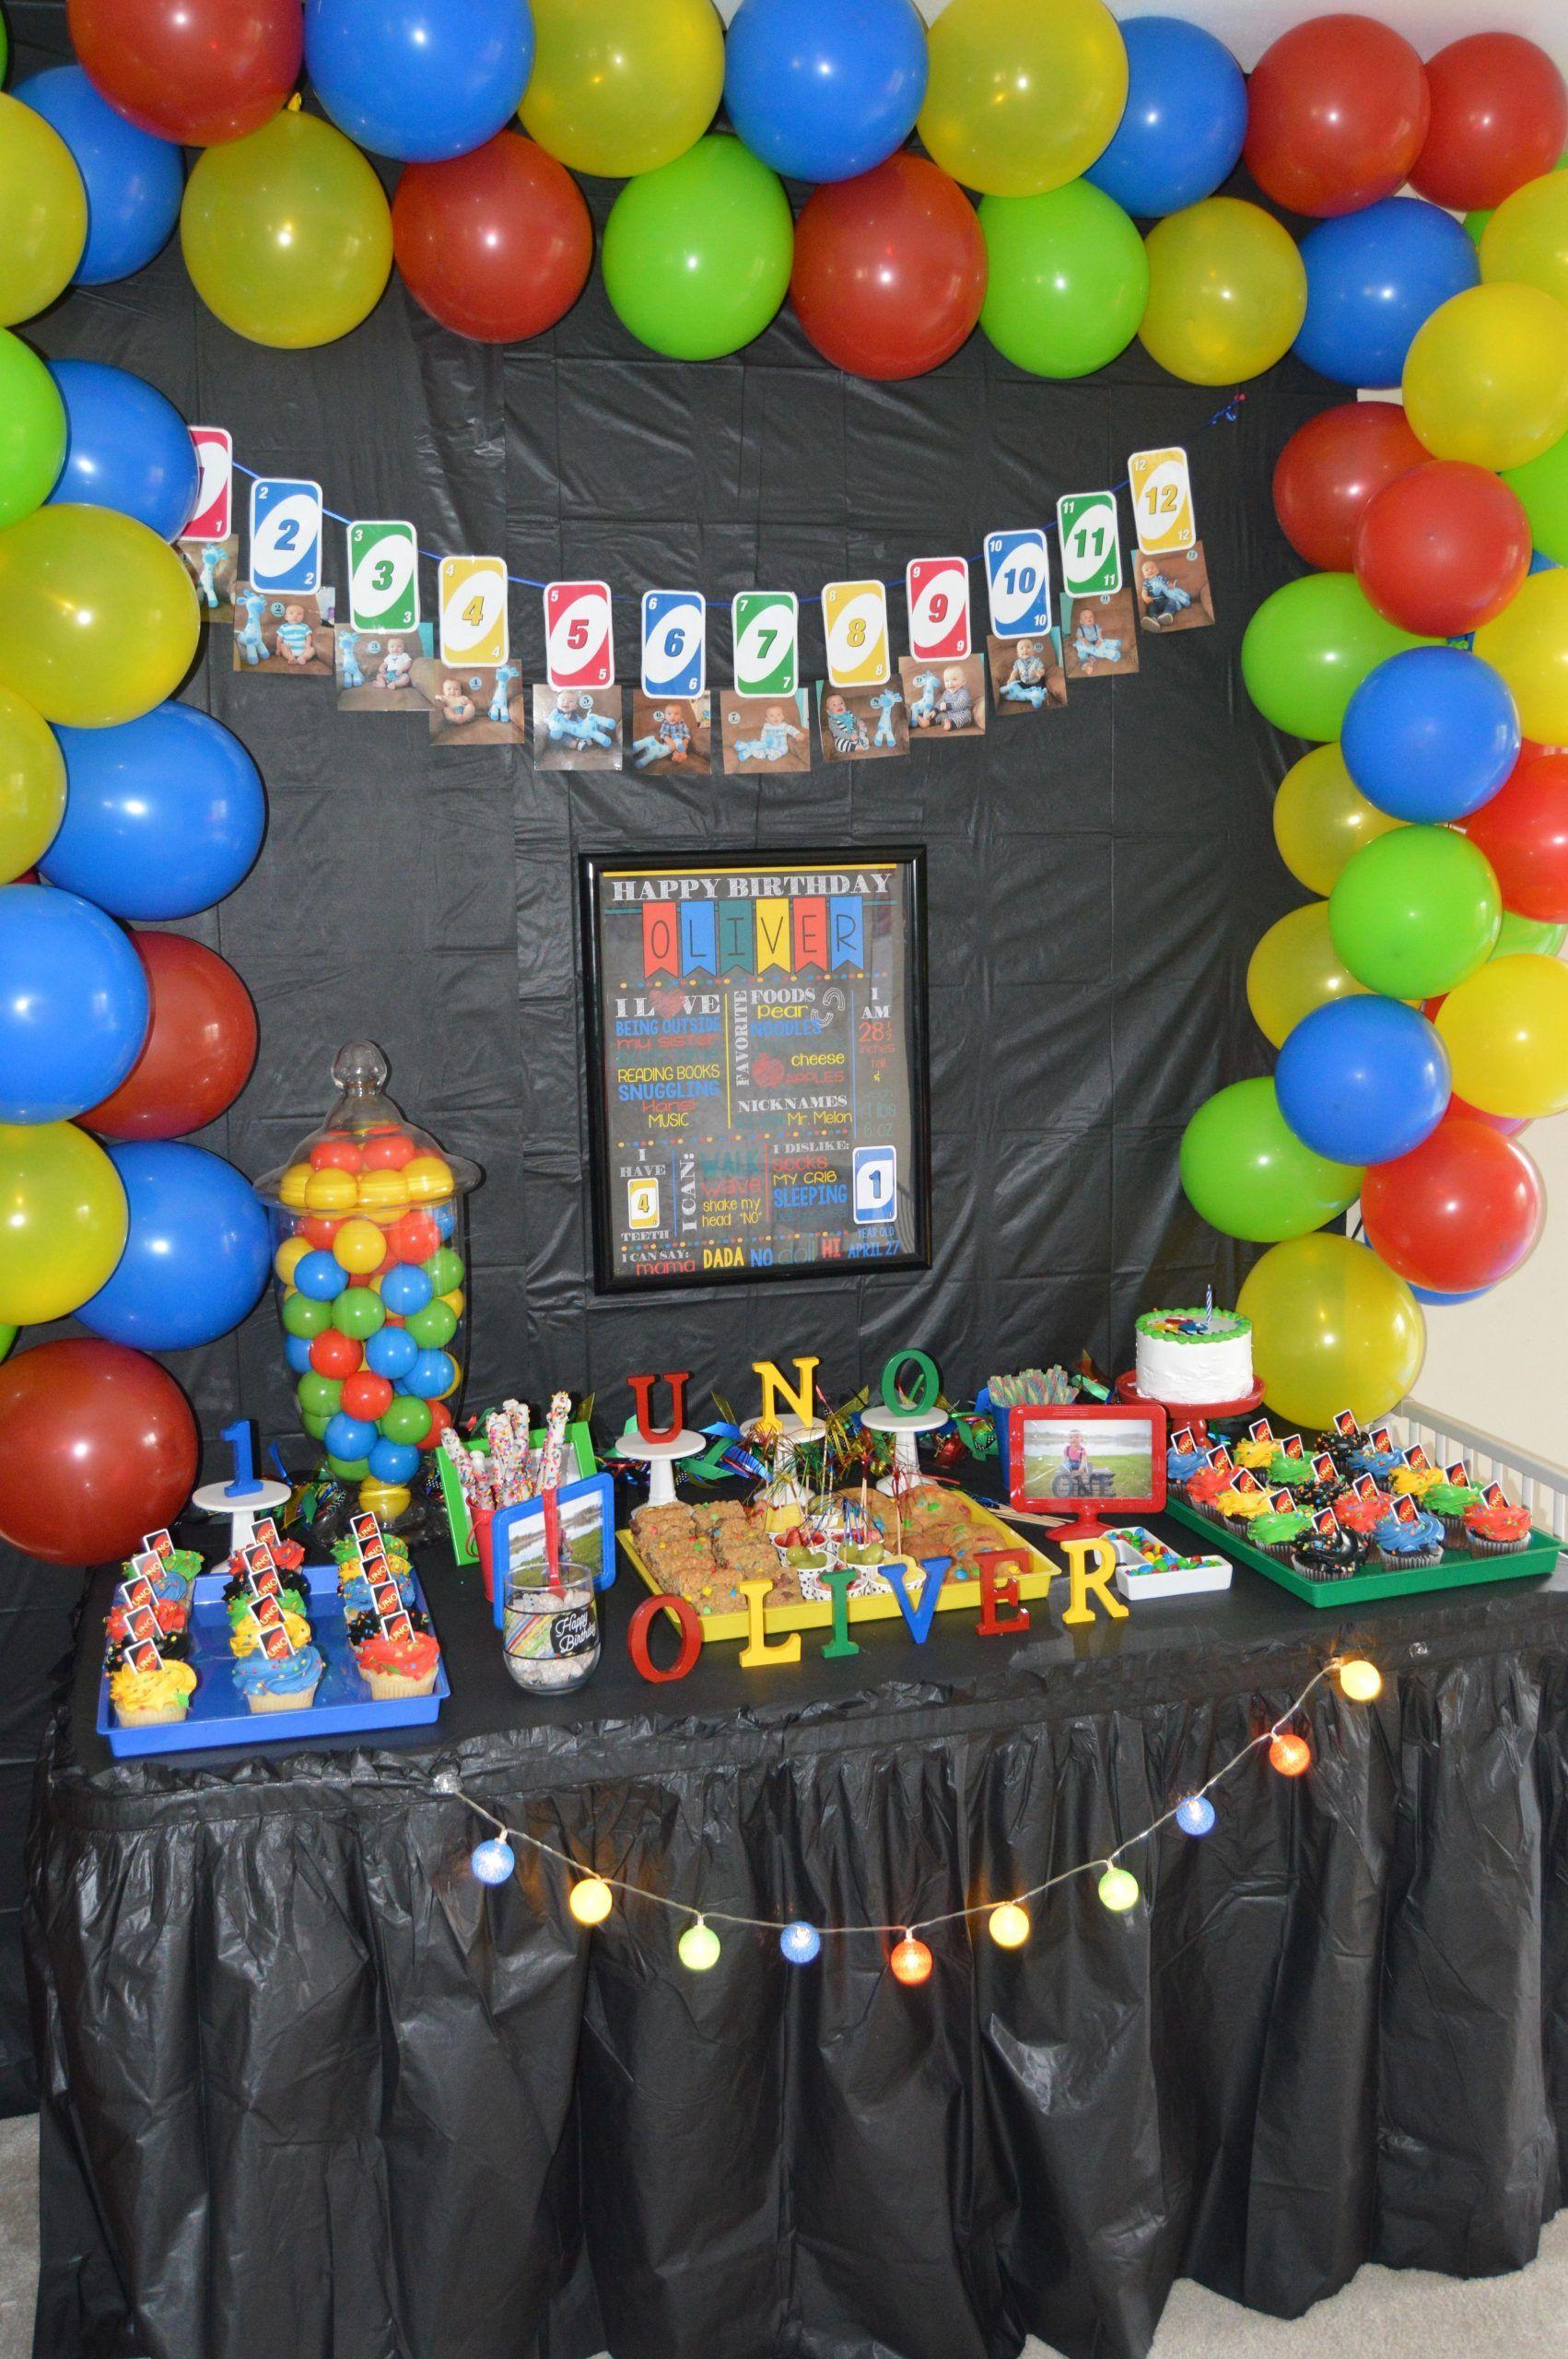 5 Year Old Boy Birthday Party Ideas Pertaining To Ideas Birthday Ideas Make It Boy Birthday Party Themes Boy Birthday Parties Birthday Themes For Boys